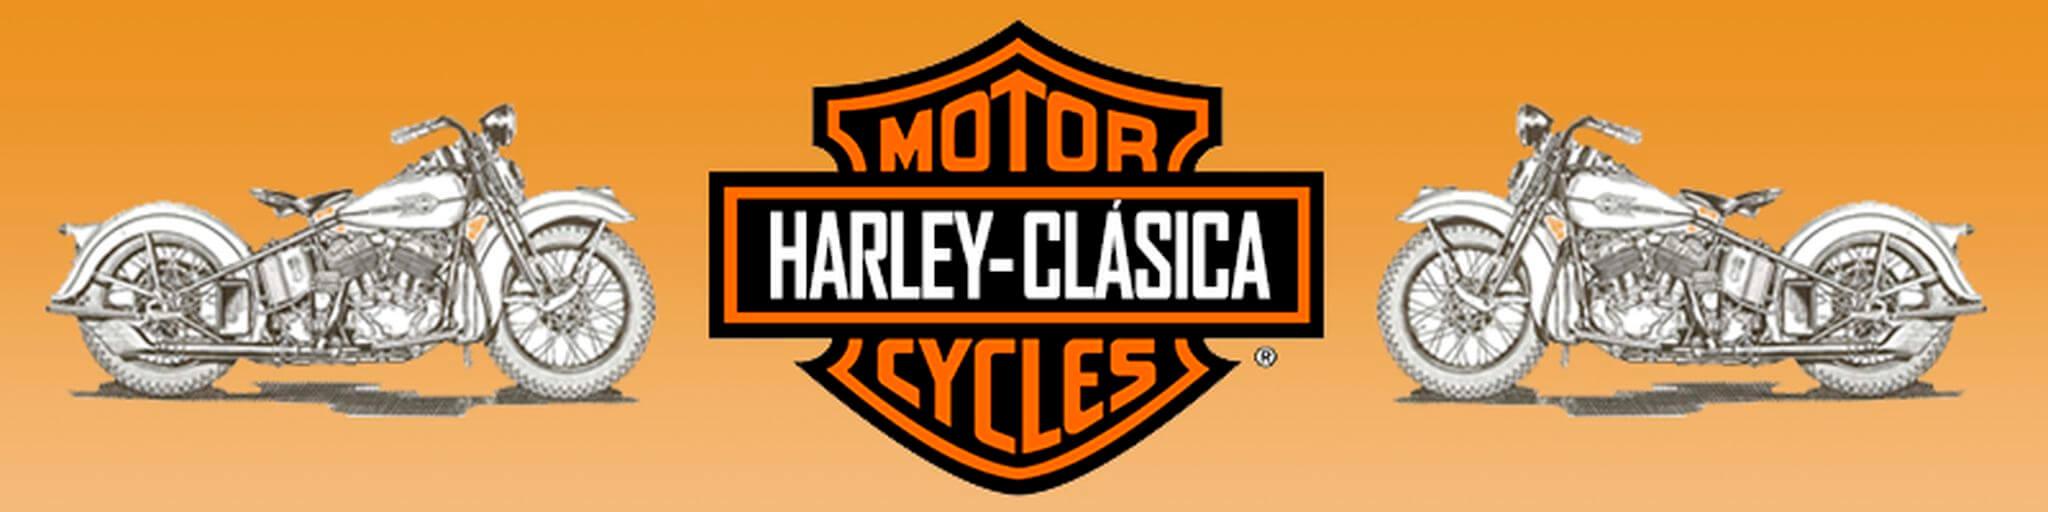 Harley-Clasica